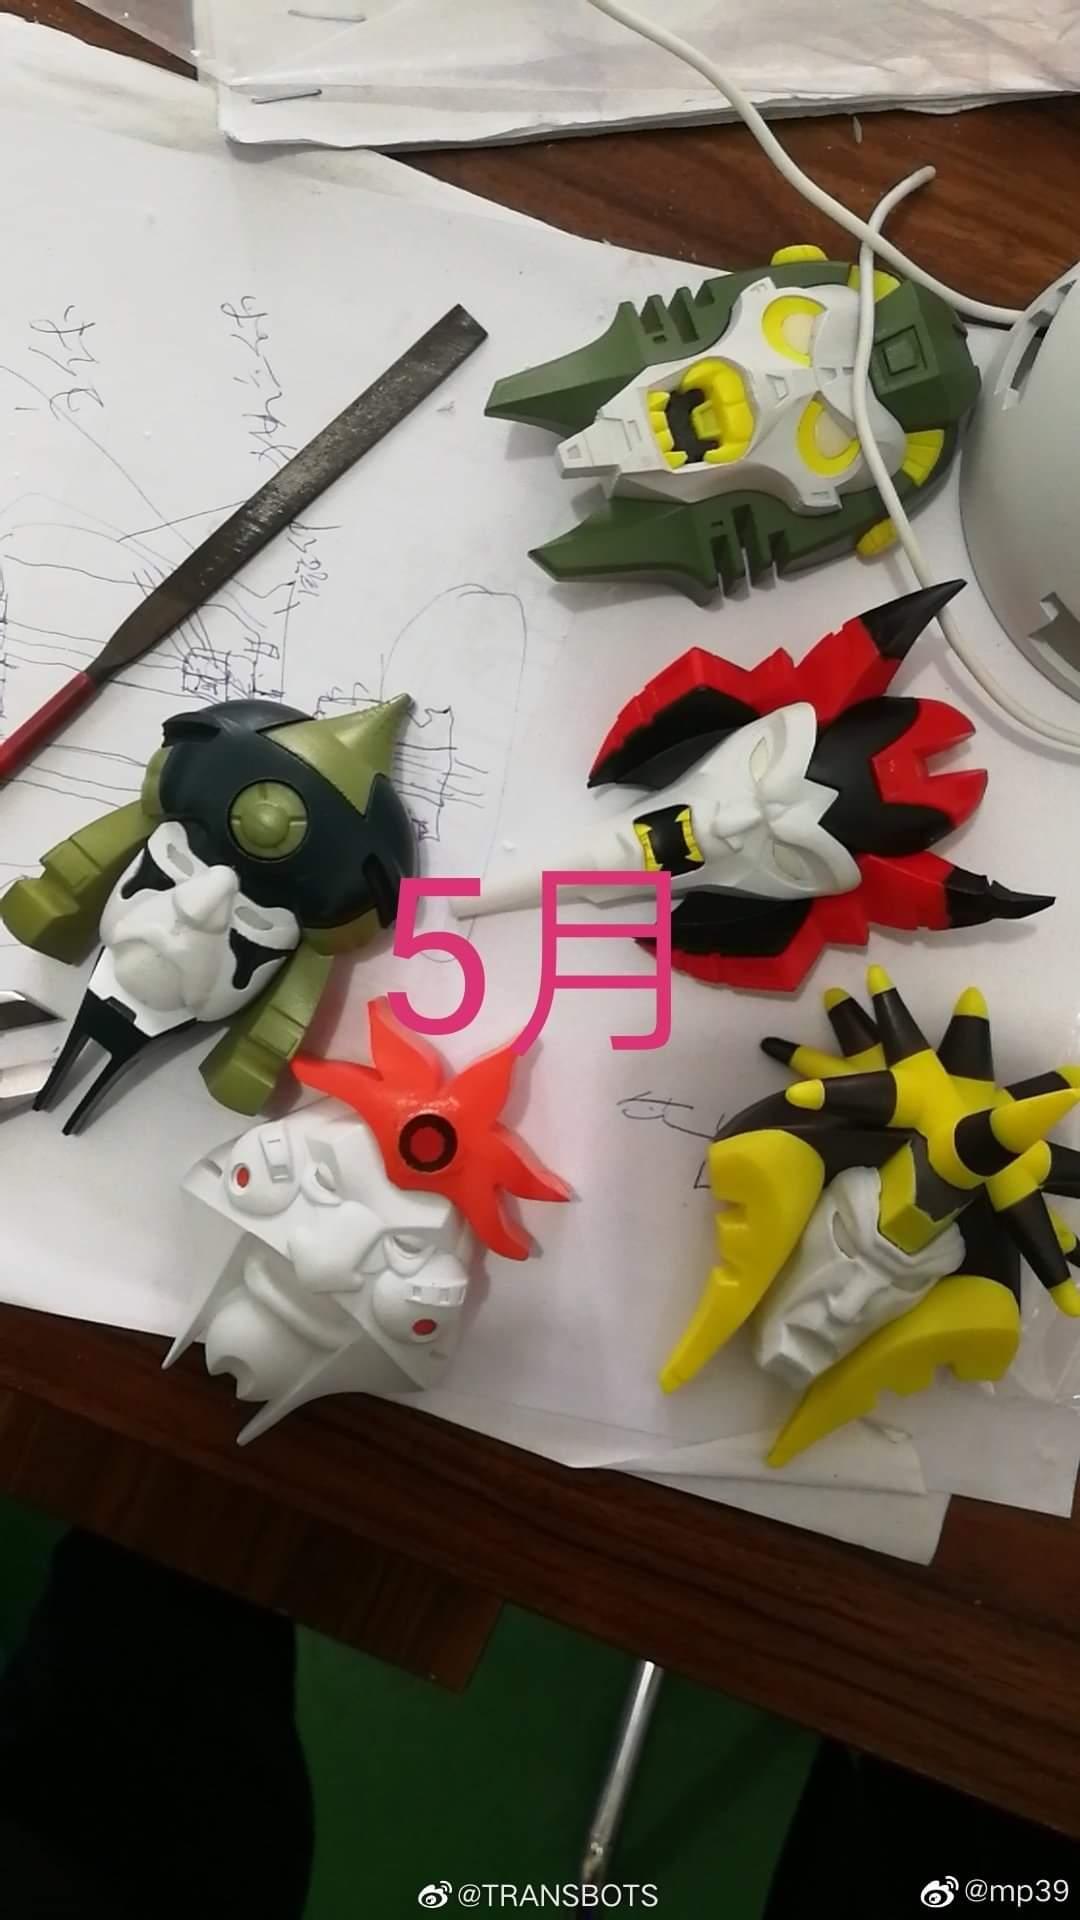 [X-Transbots] Produit Tiers - Jouets MM-xx - aka Quintessons E63DzAKz_o